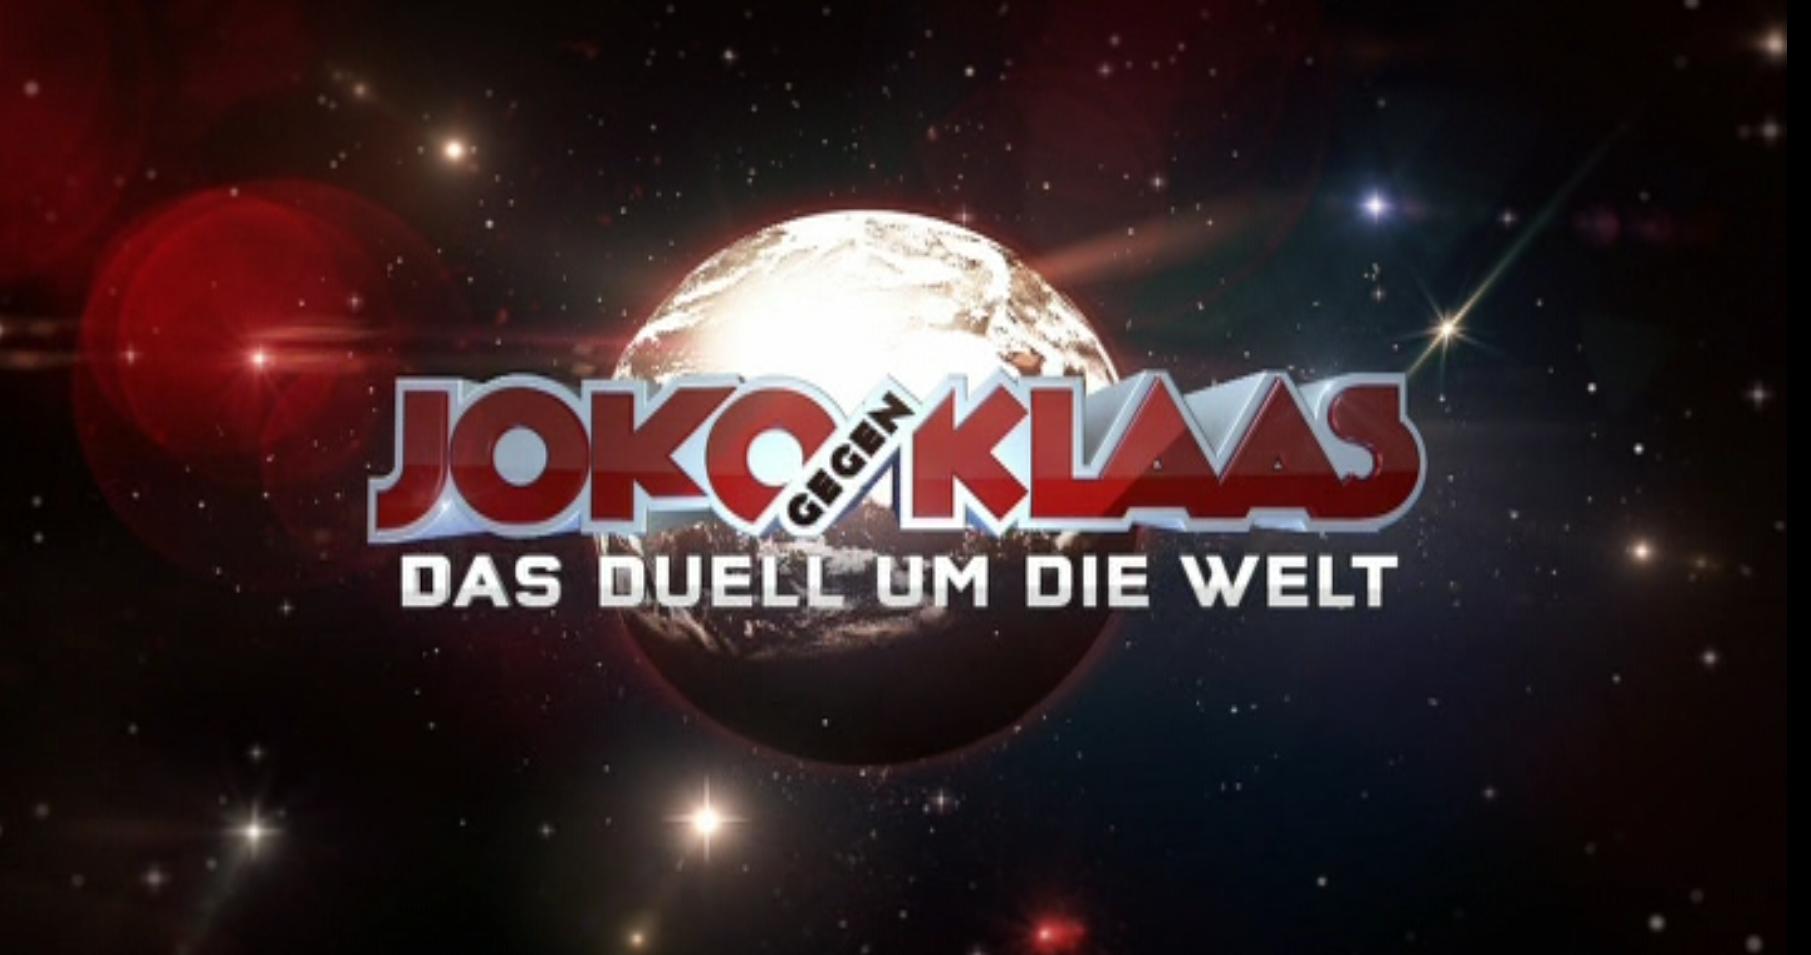 Medienkorrespondenz Joko Gegen Klaasnbsp Das Duell Um Die Welt